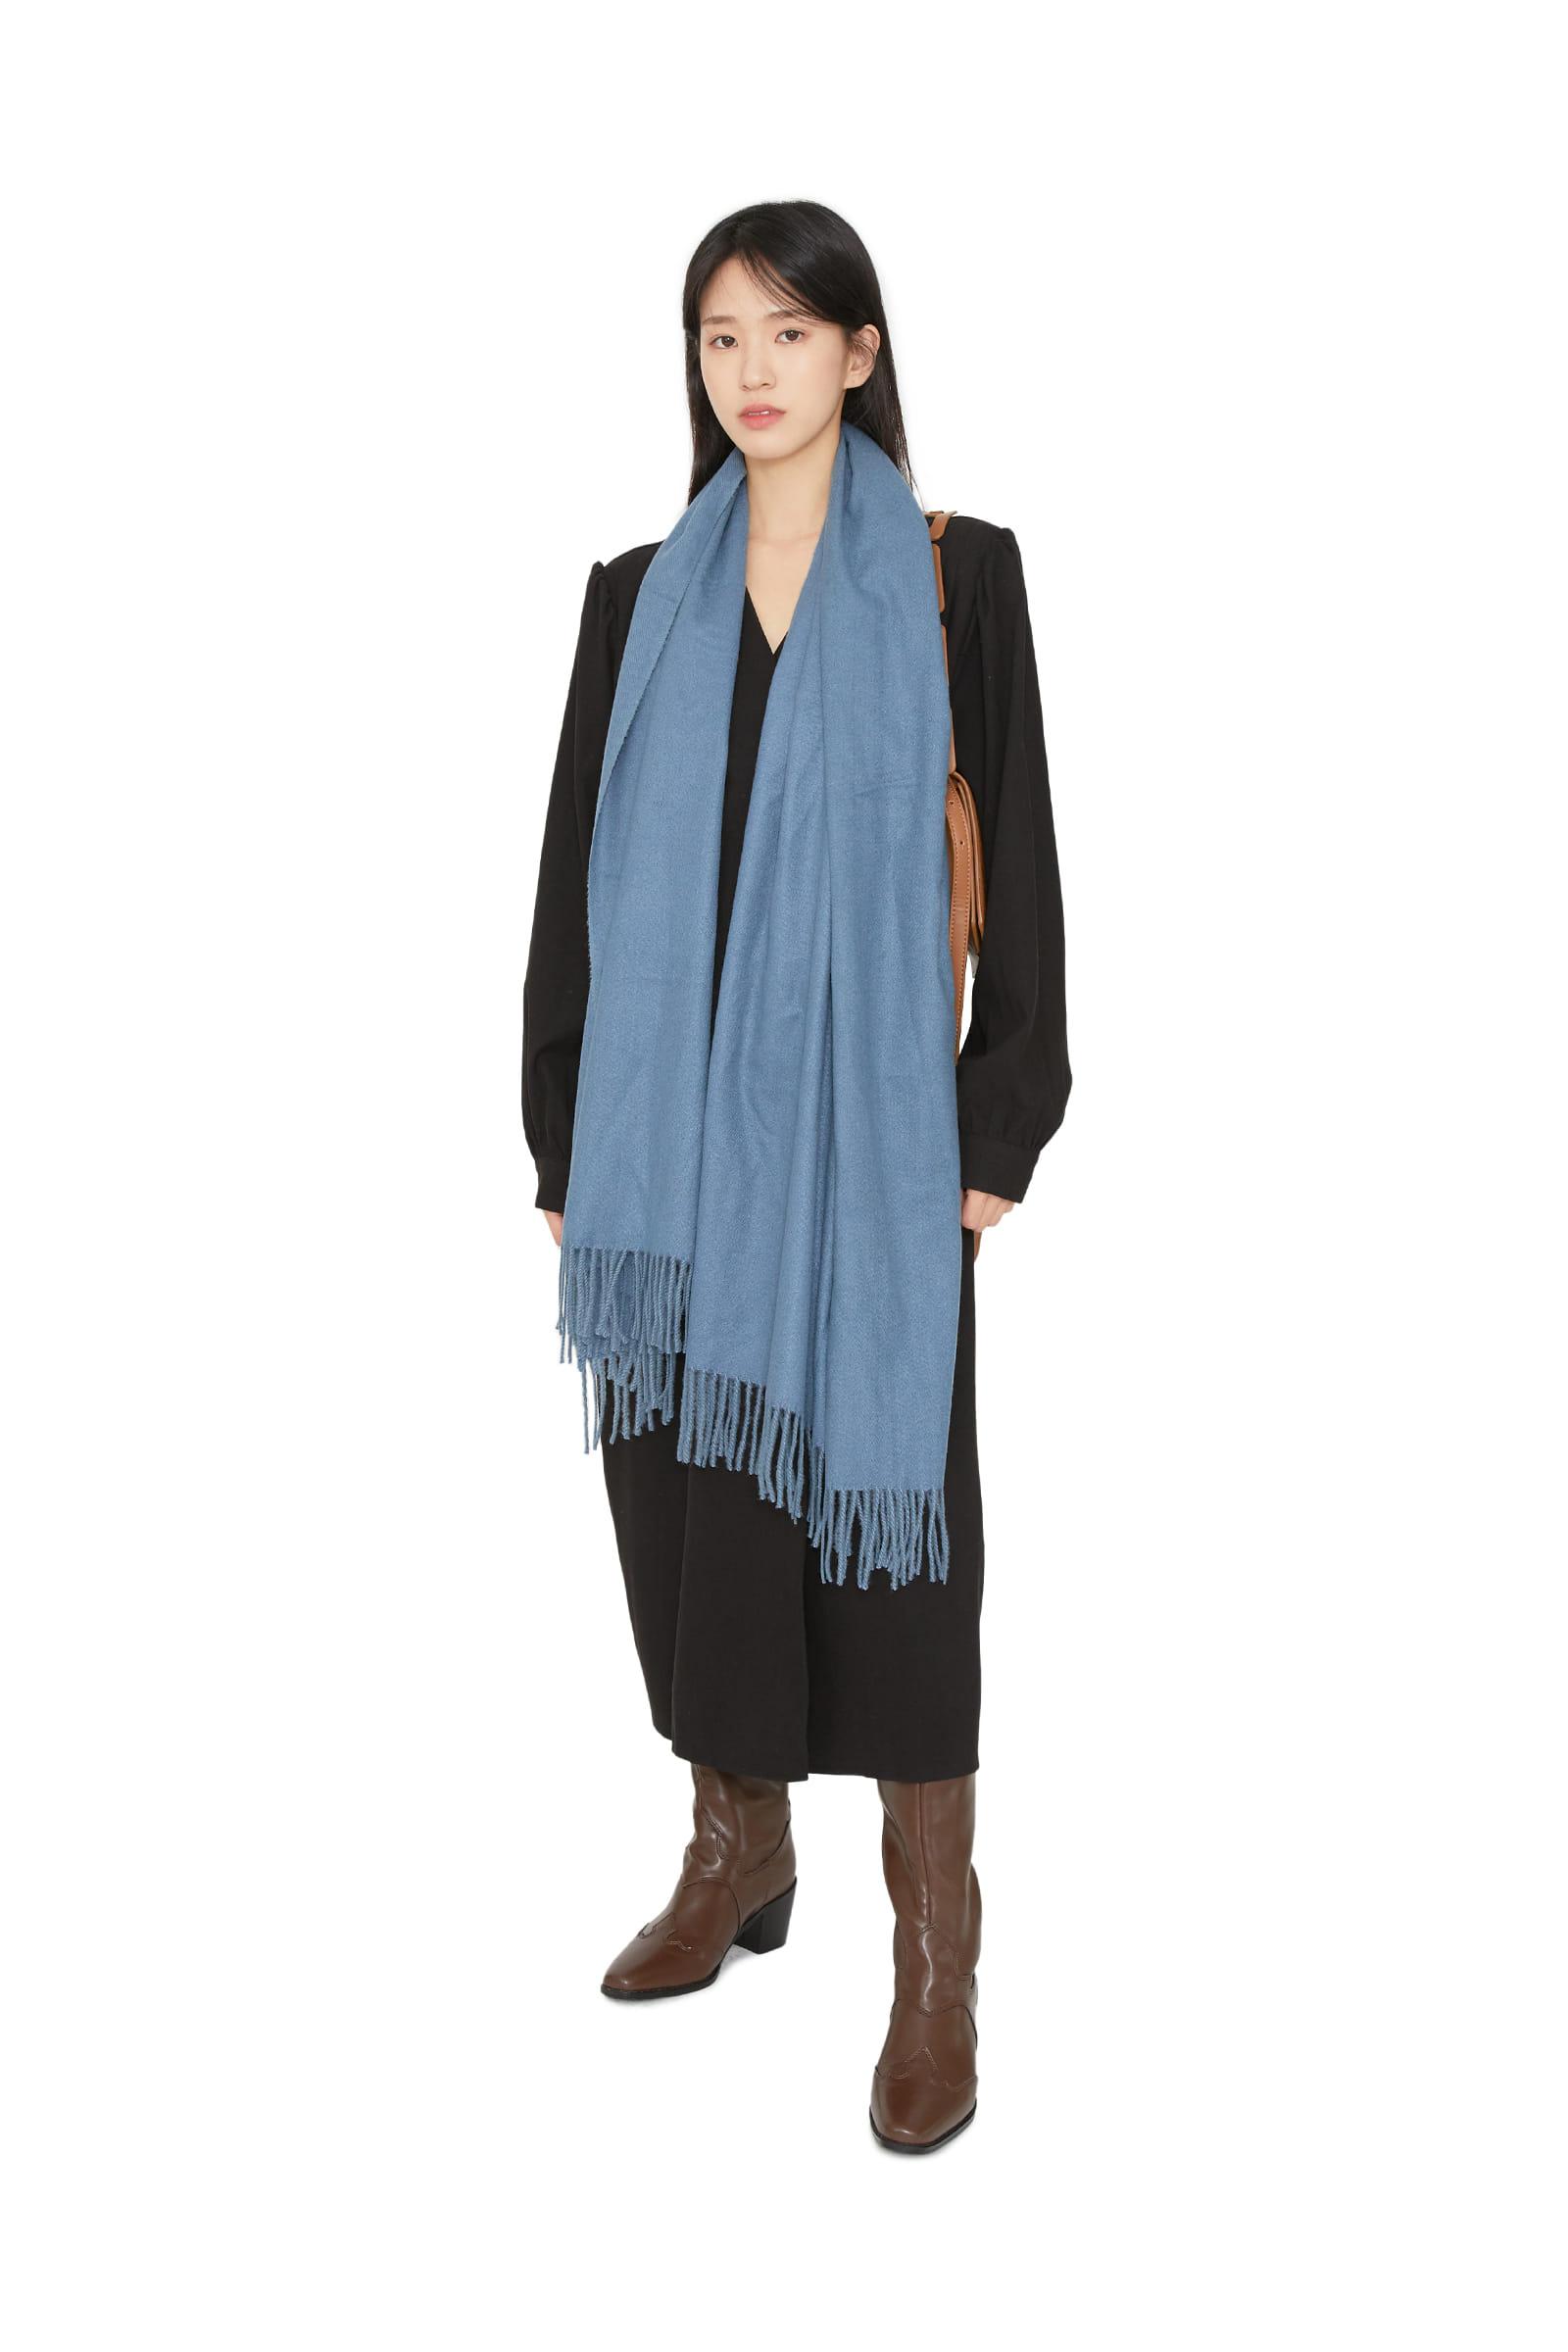 Soft autumn tassel scarf